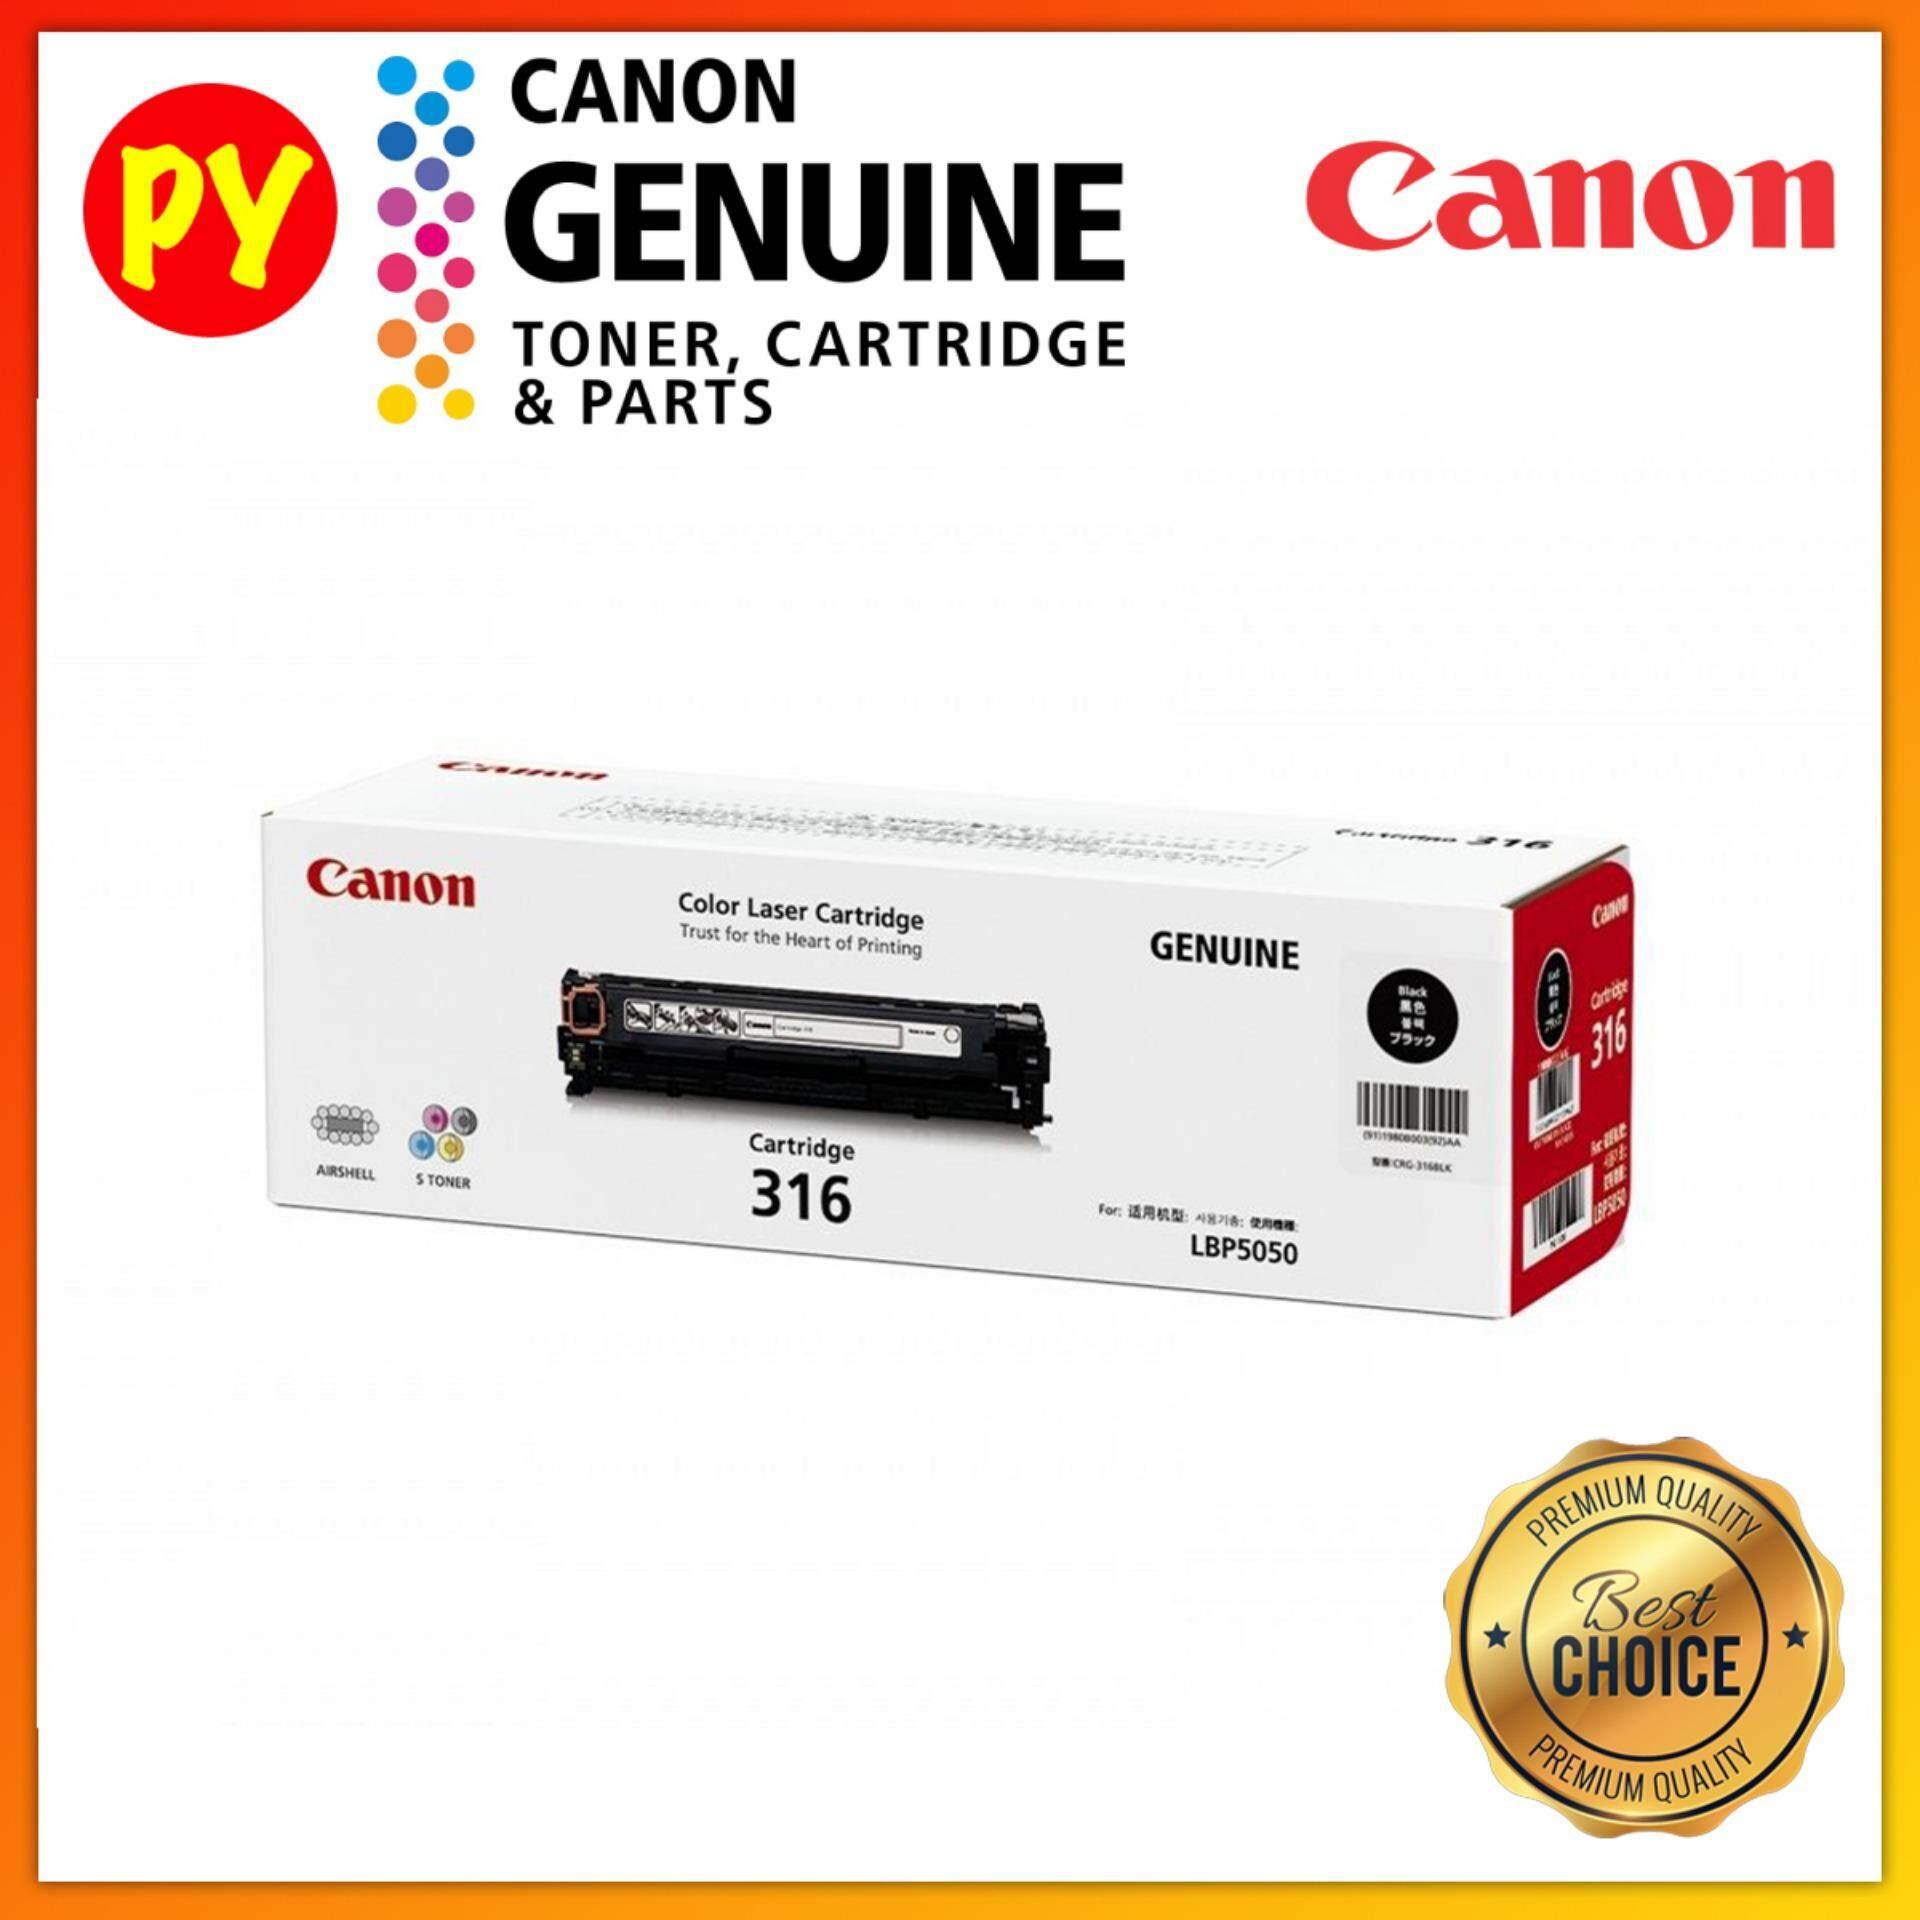 Canon Cart-337 Black Toner Cartridges - for printer MF235 / MF232w / MF237w